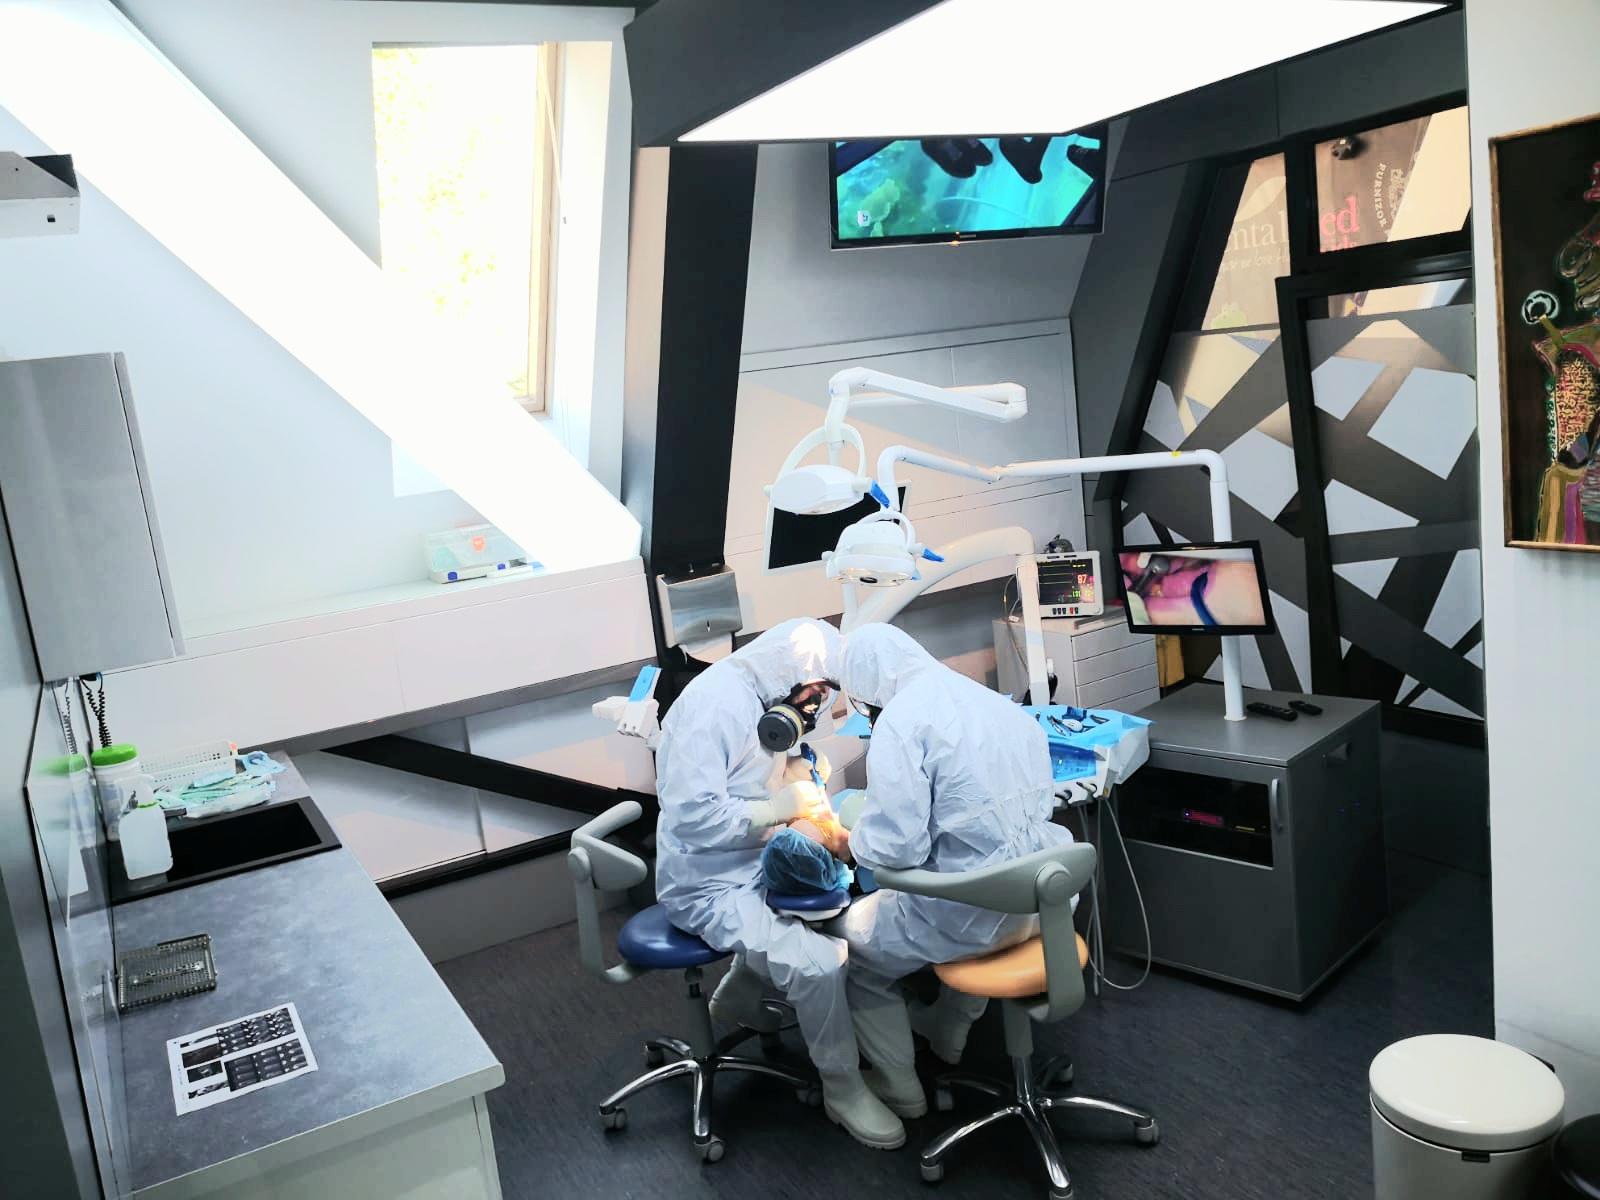 20200424 075839 Urgente stomatologice in Starea de Urgenta nationala